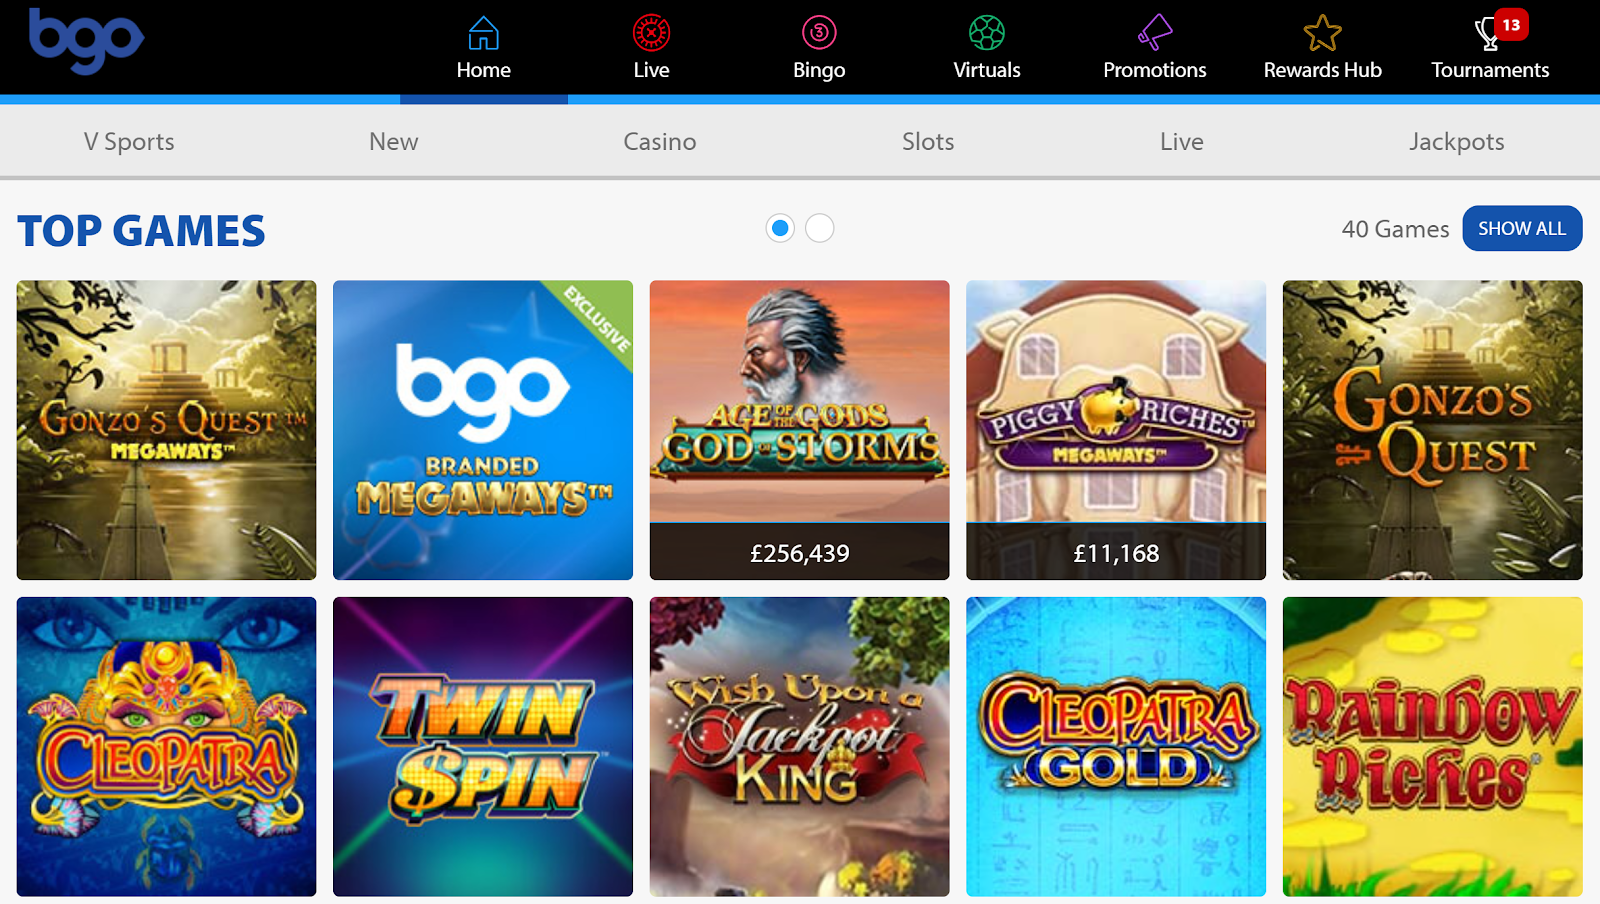 bgo Casino has one of best slots bonus packages of any UK gambling site